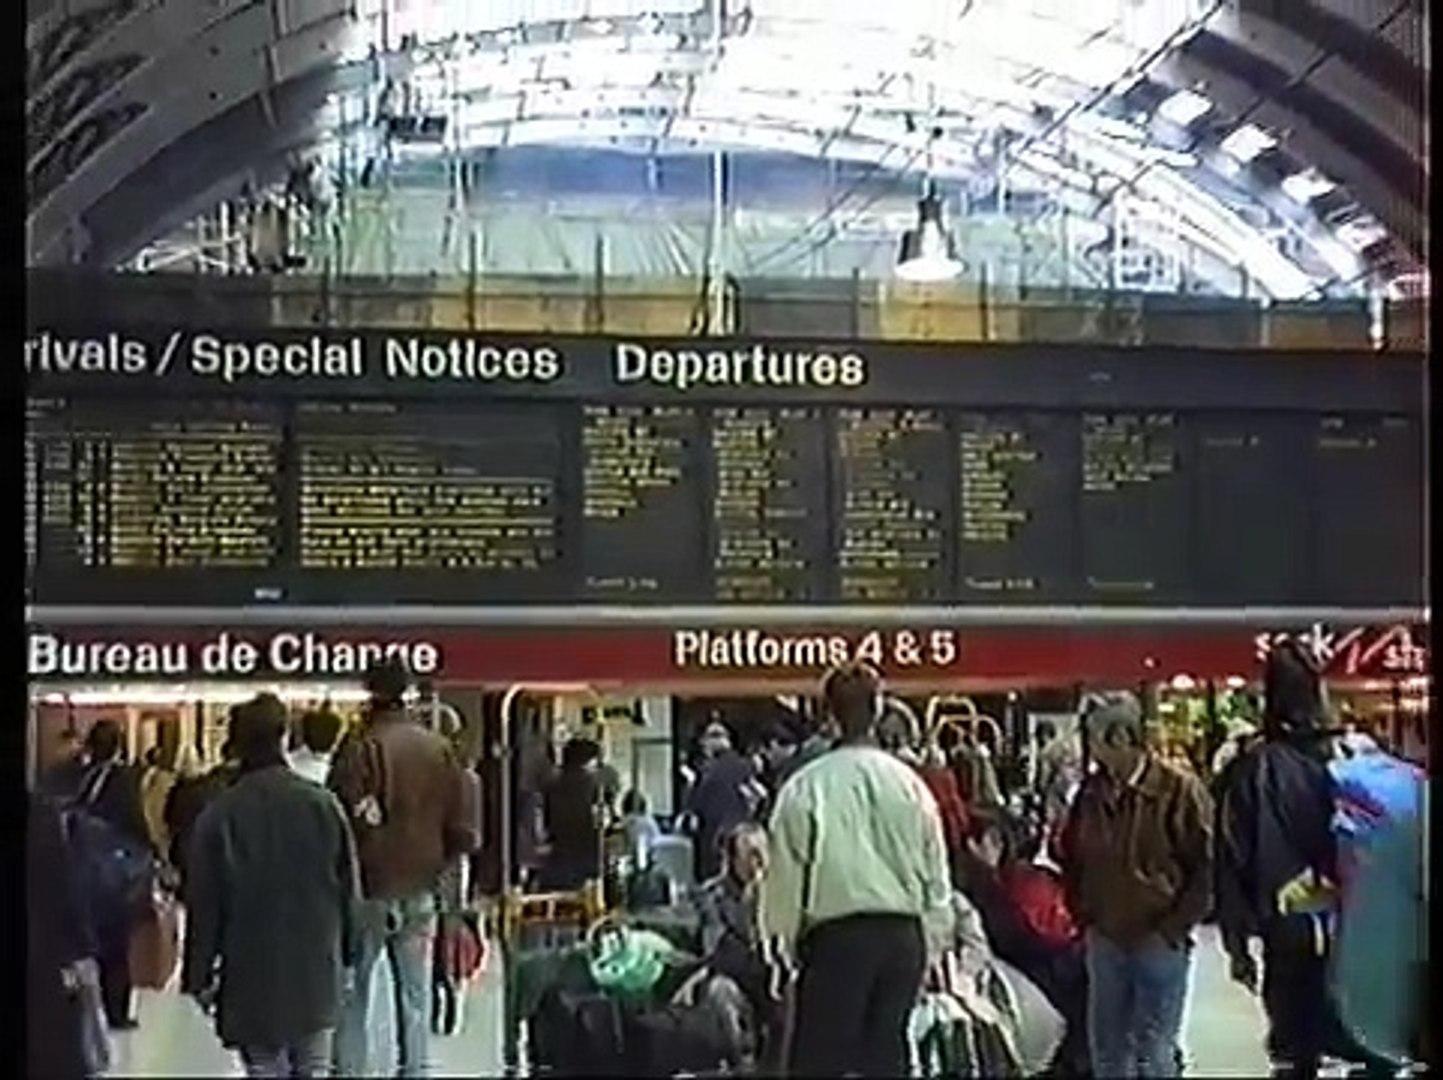 Paddington to Reading (1990) - Inter-City HST (Valenta Paxman) - December 1990